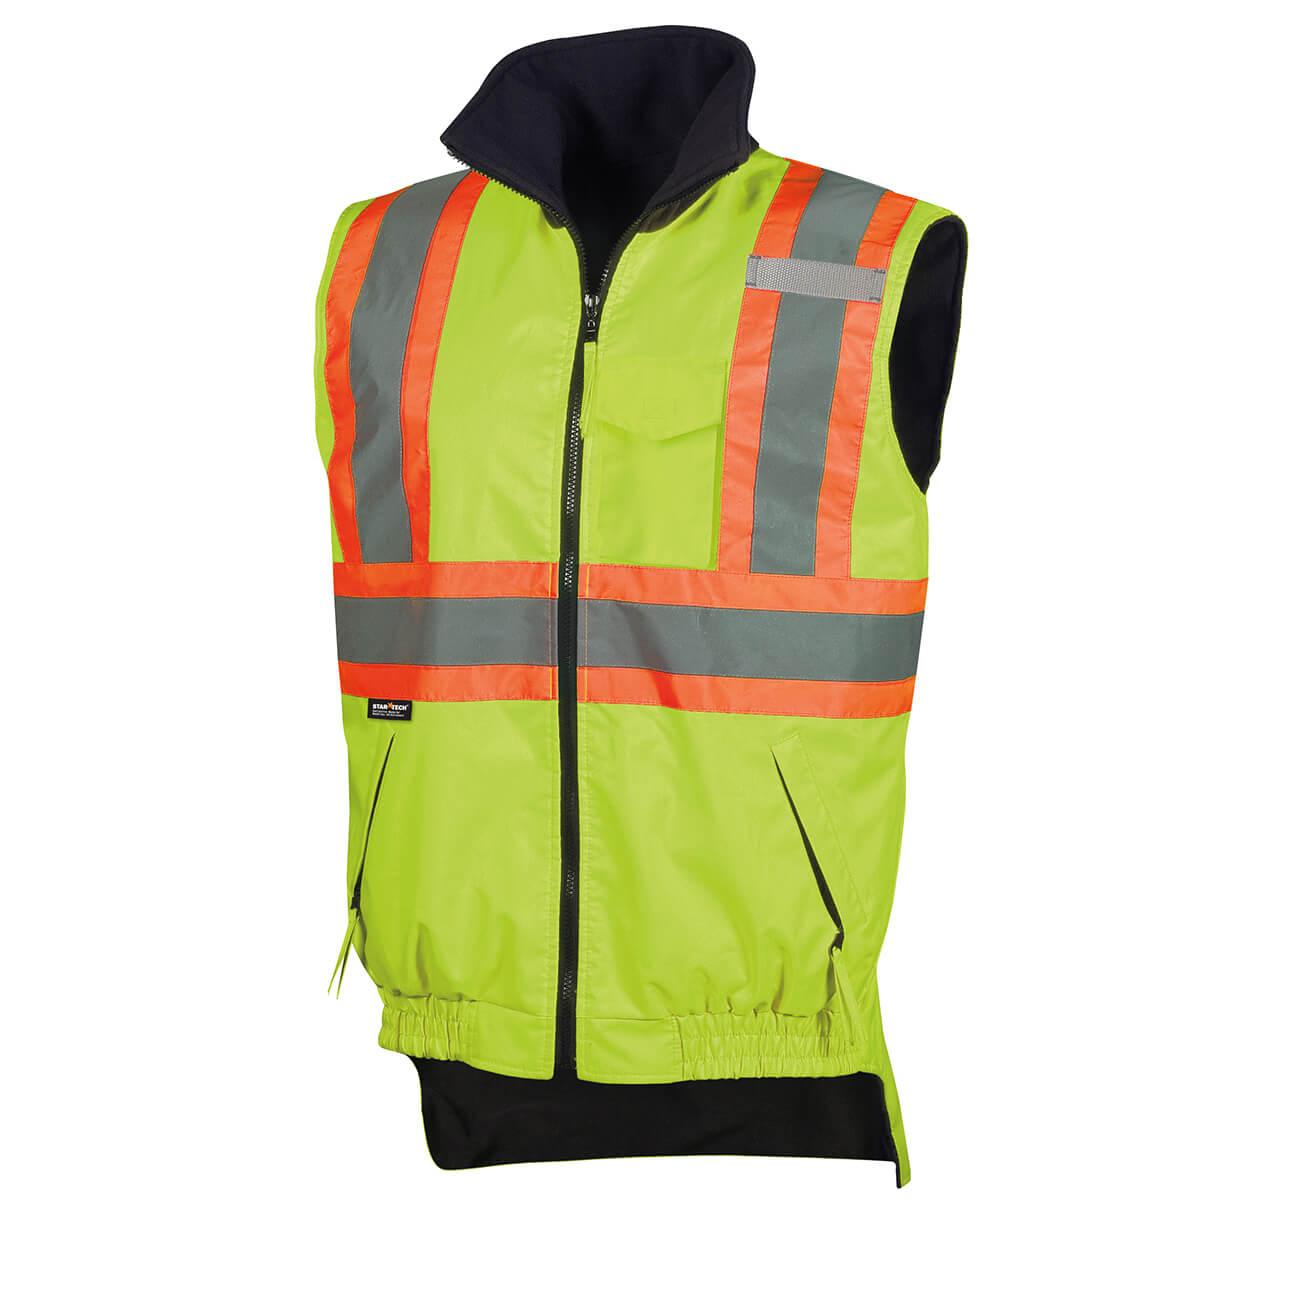 Pioneer Hi-Viz Reversible Fleece Lined Vest V1020460 - 6699